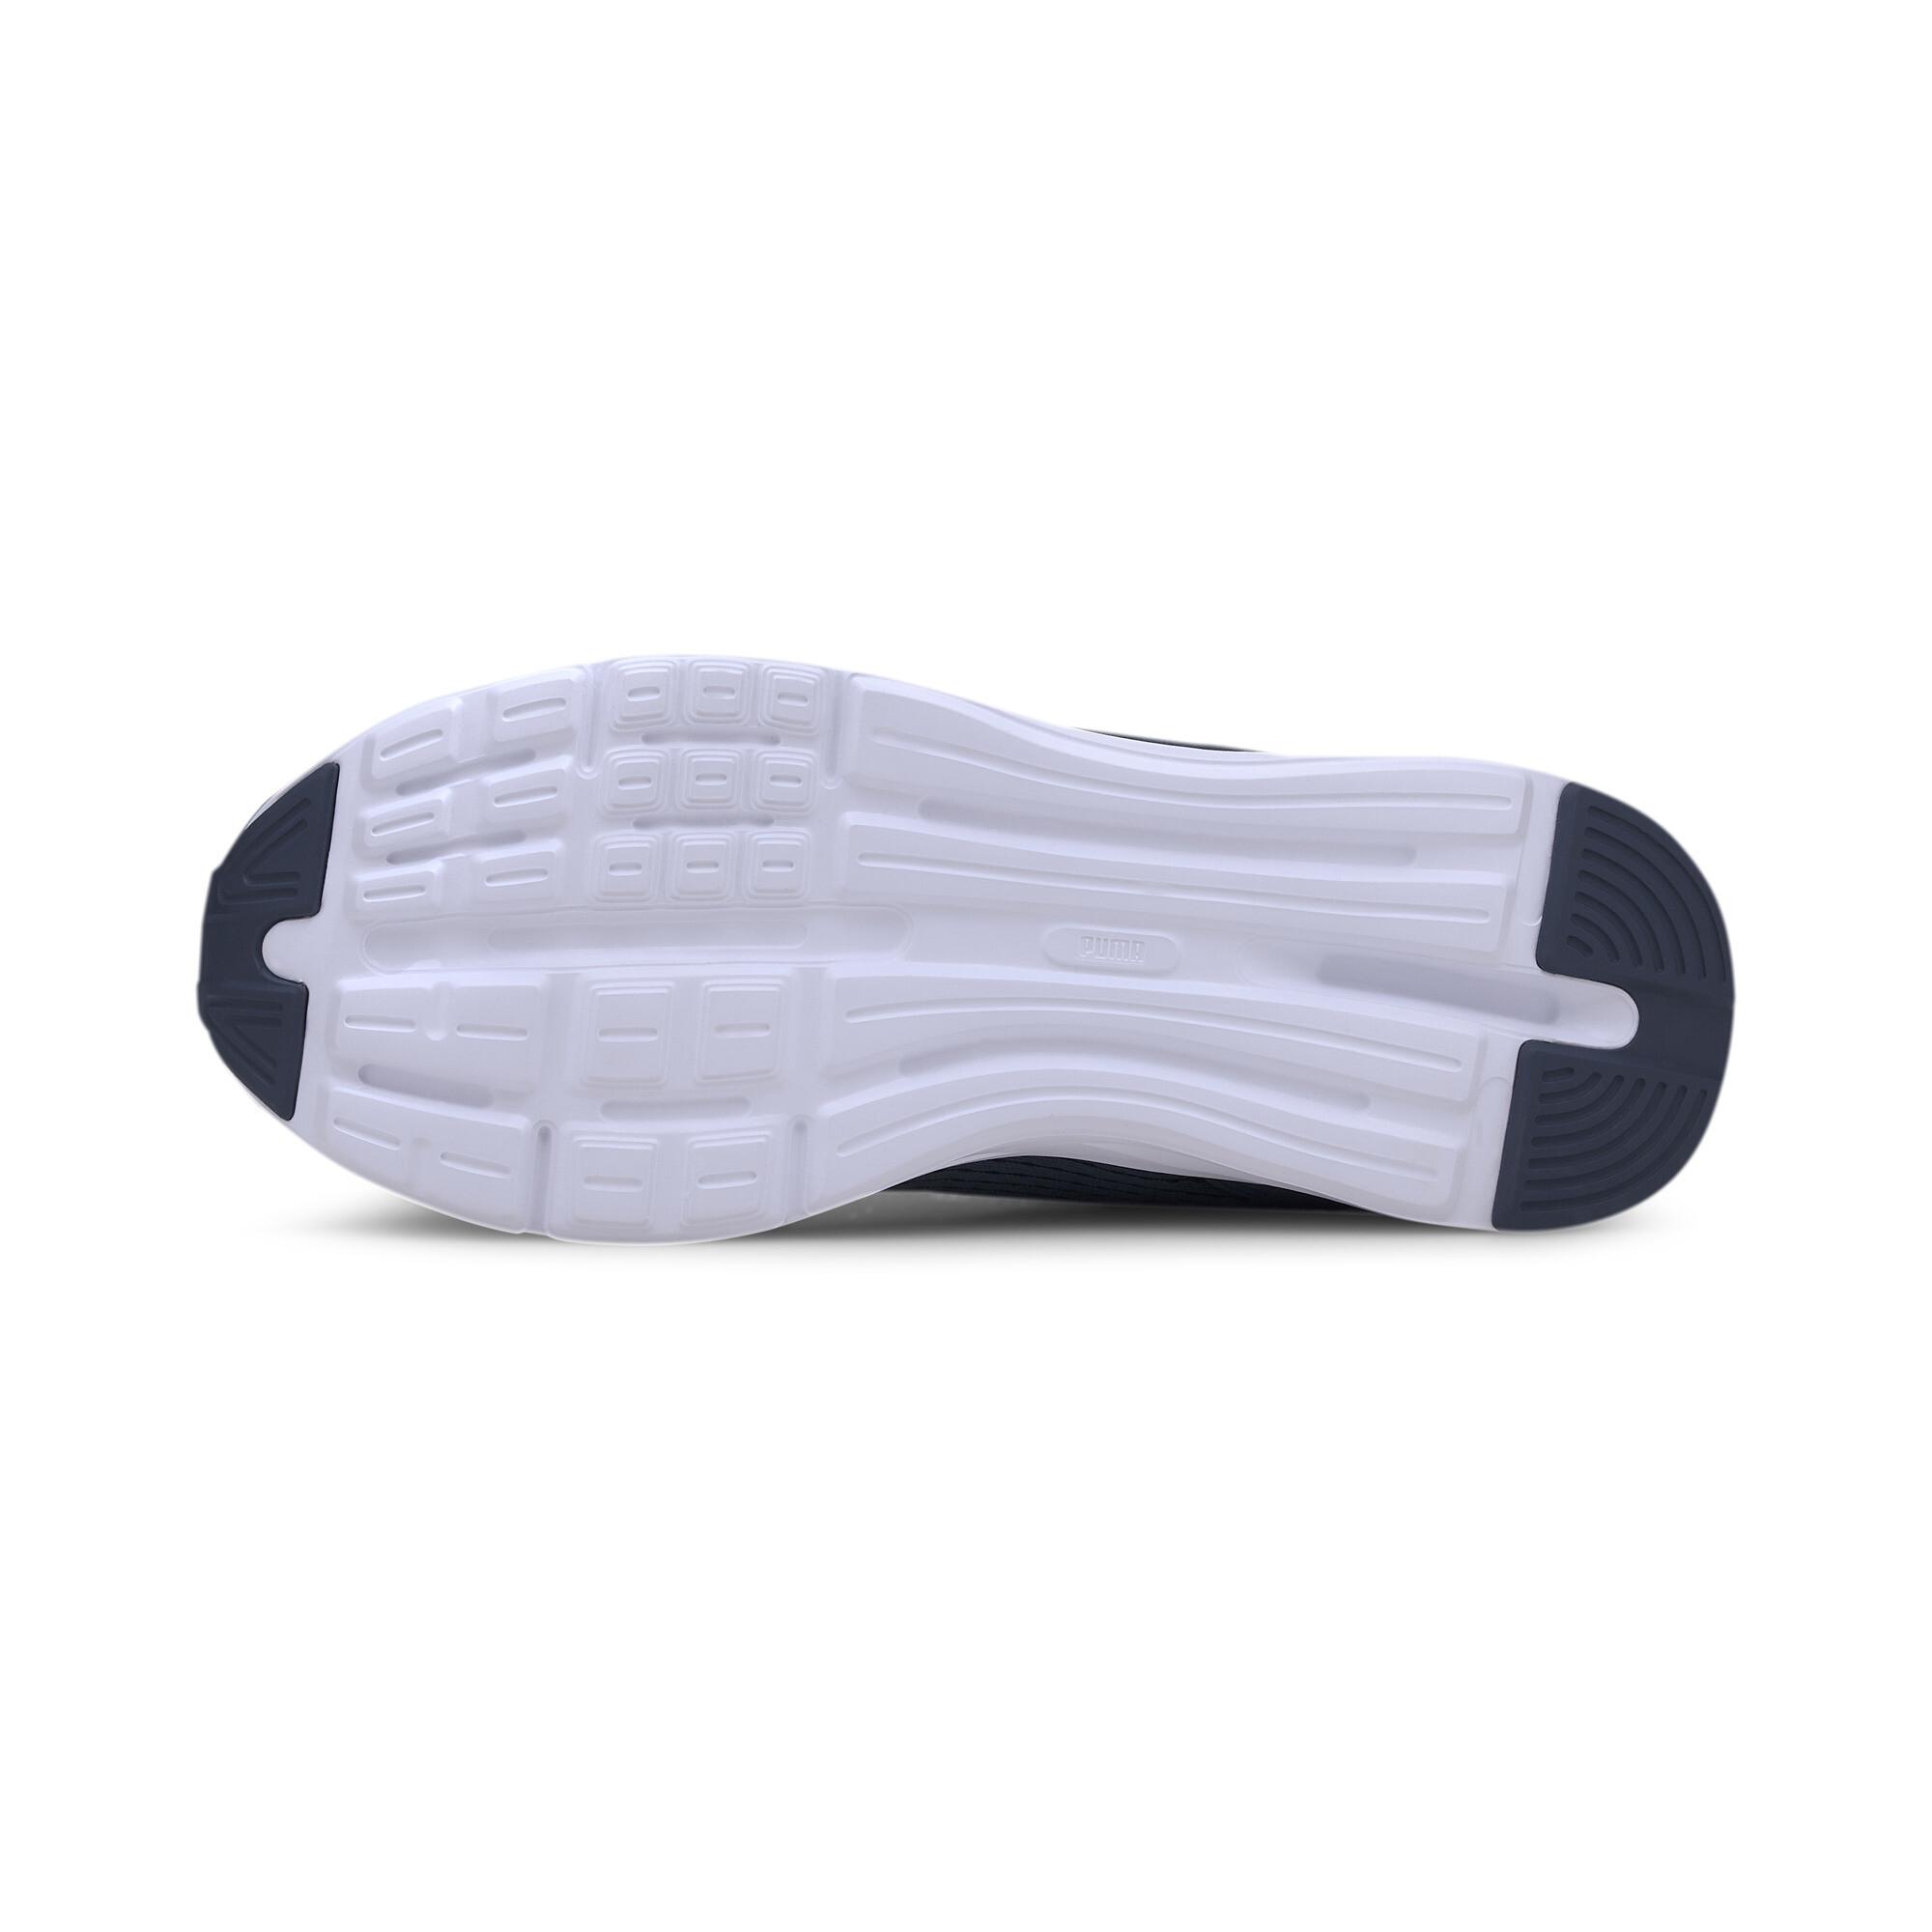 PUMA-Men-039-s-Enzo-Beta-Mesh-Training-Shoes thumbnail 20